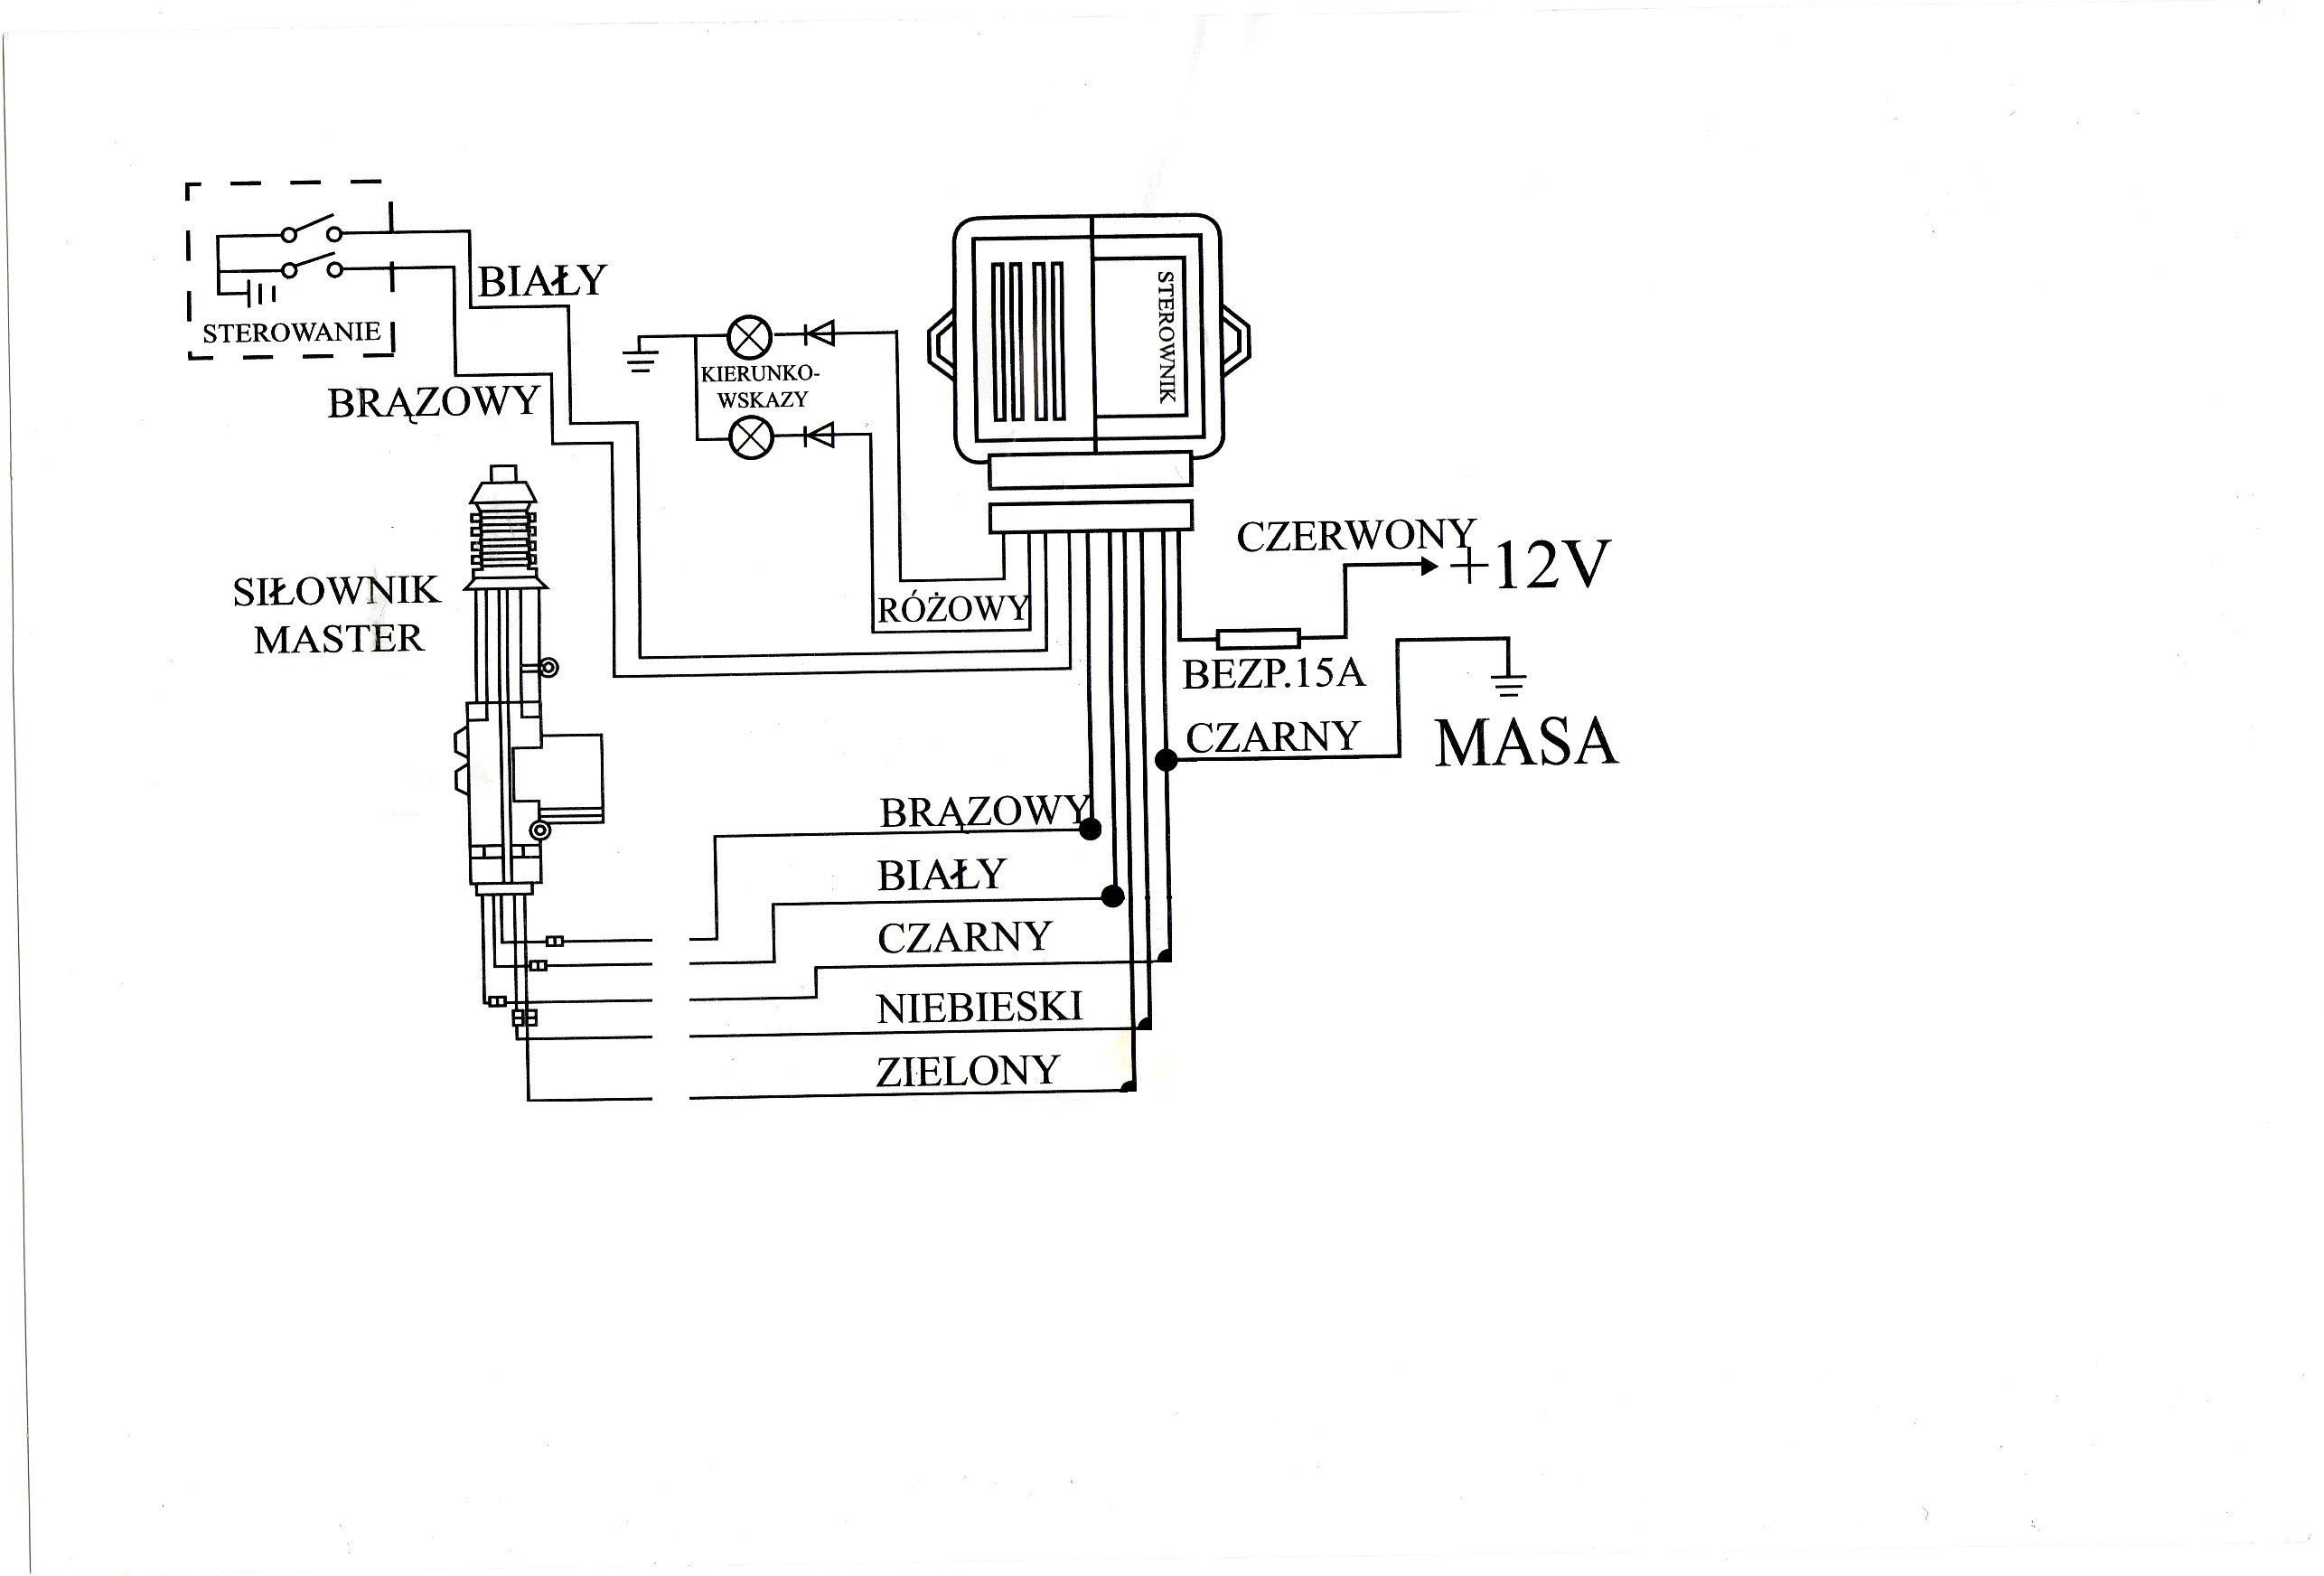 centralny zamek rtx hammer cl8